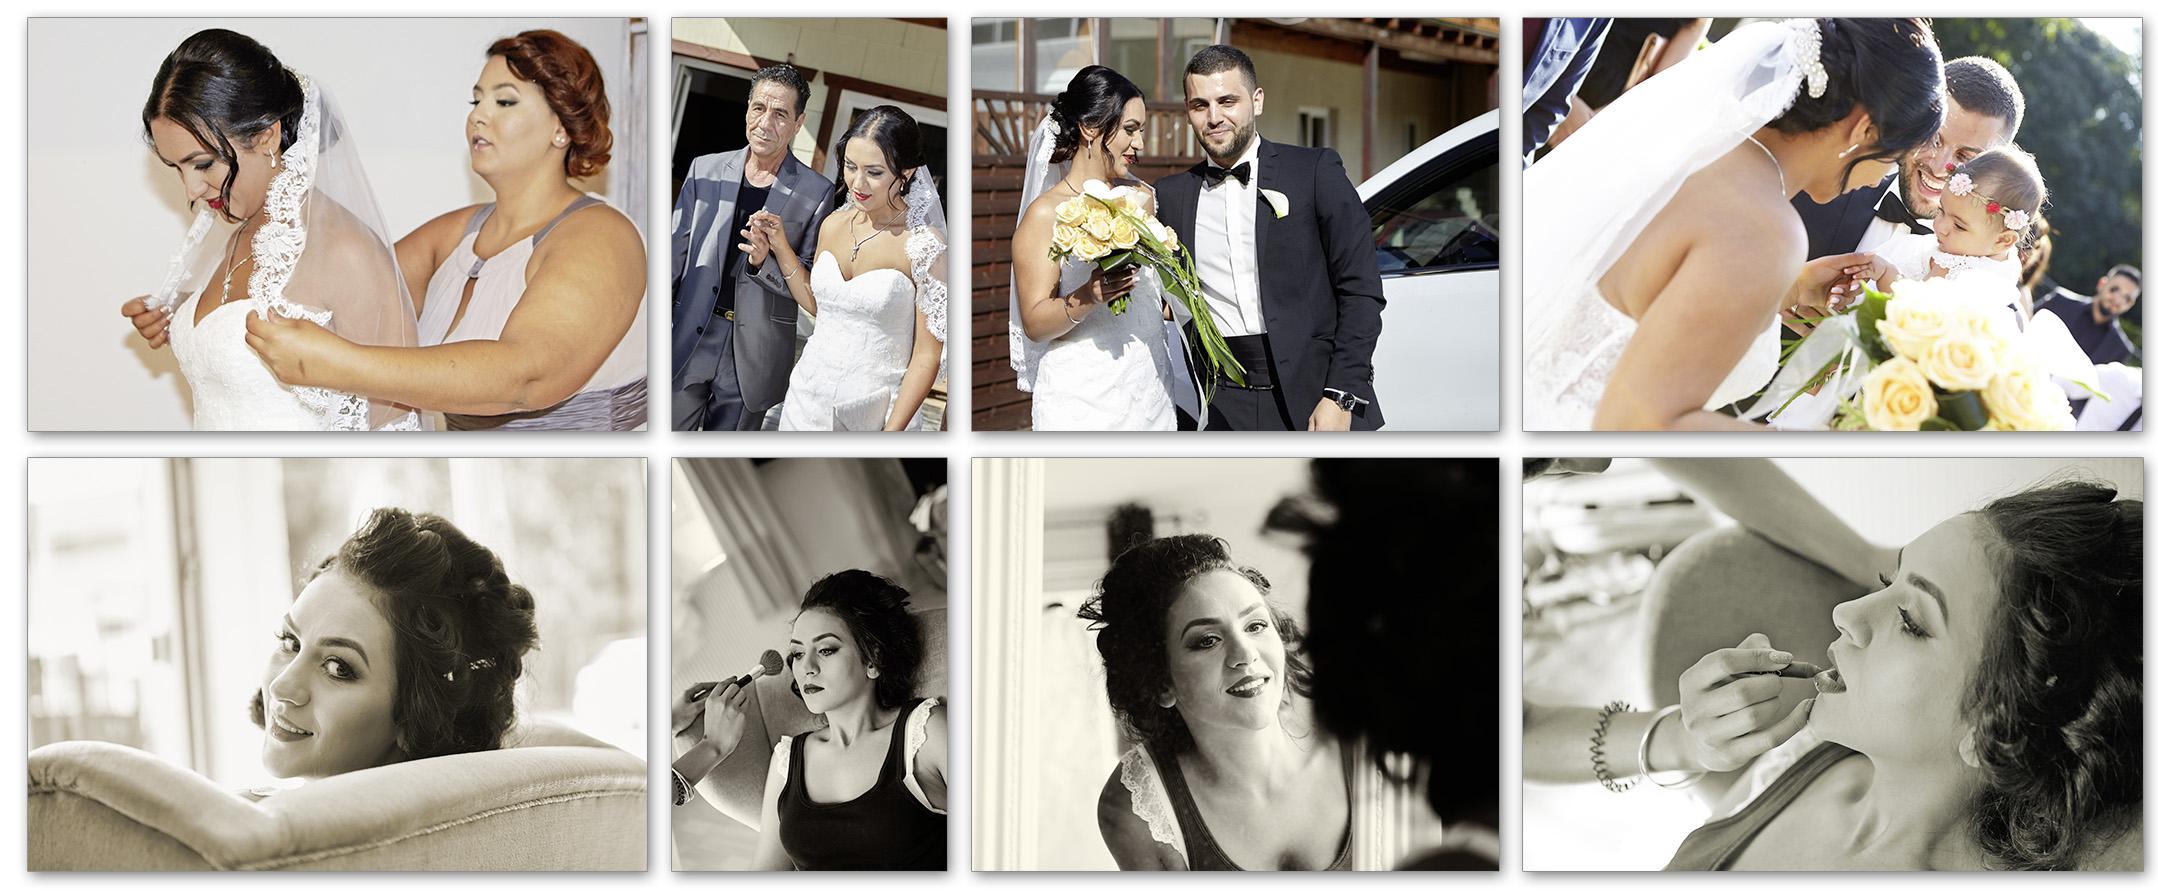 Hochzeitsfotos, Hochzeits-Reportagen, Hochzeitsvideos, After-Wedding-Fotos, Hochzeitsfotografie@blickfang2.de_fotostudio_filmstudio